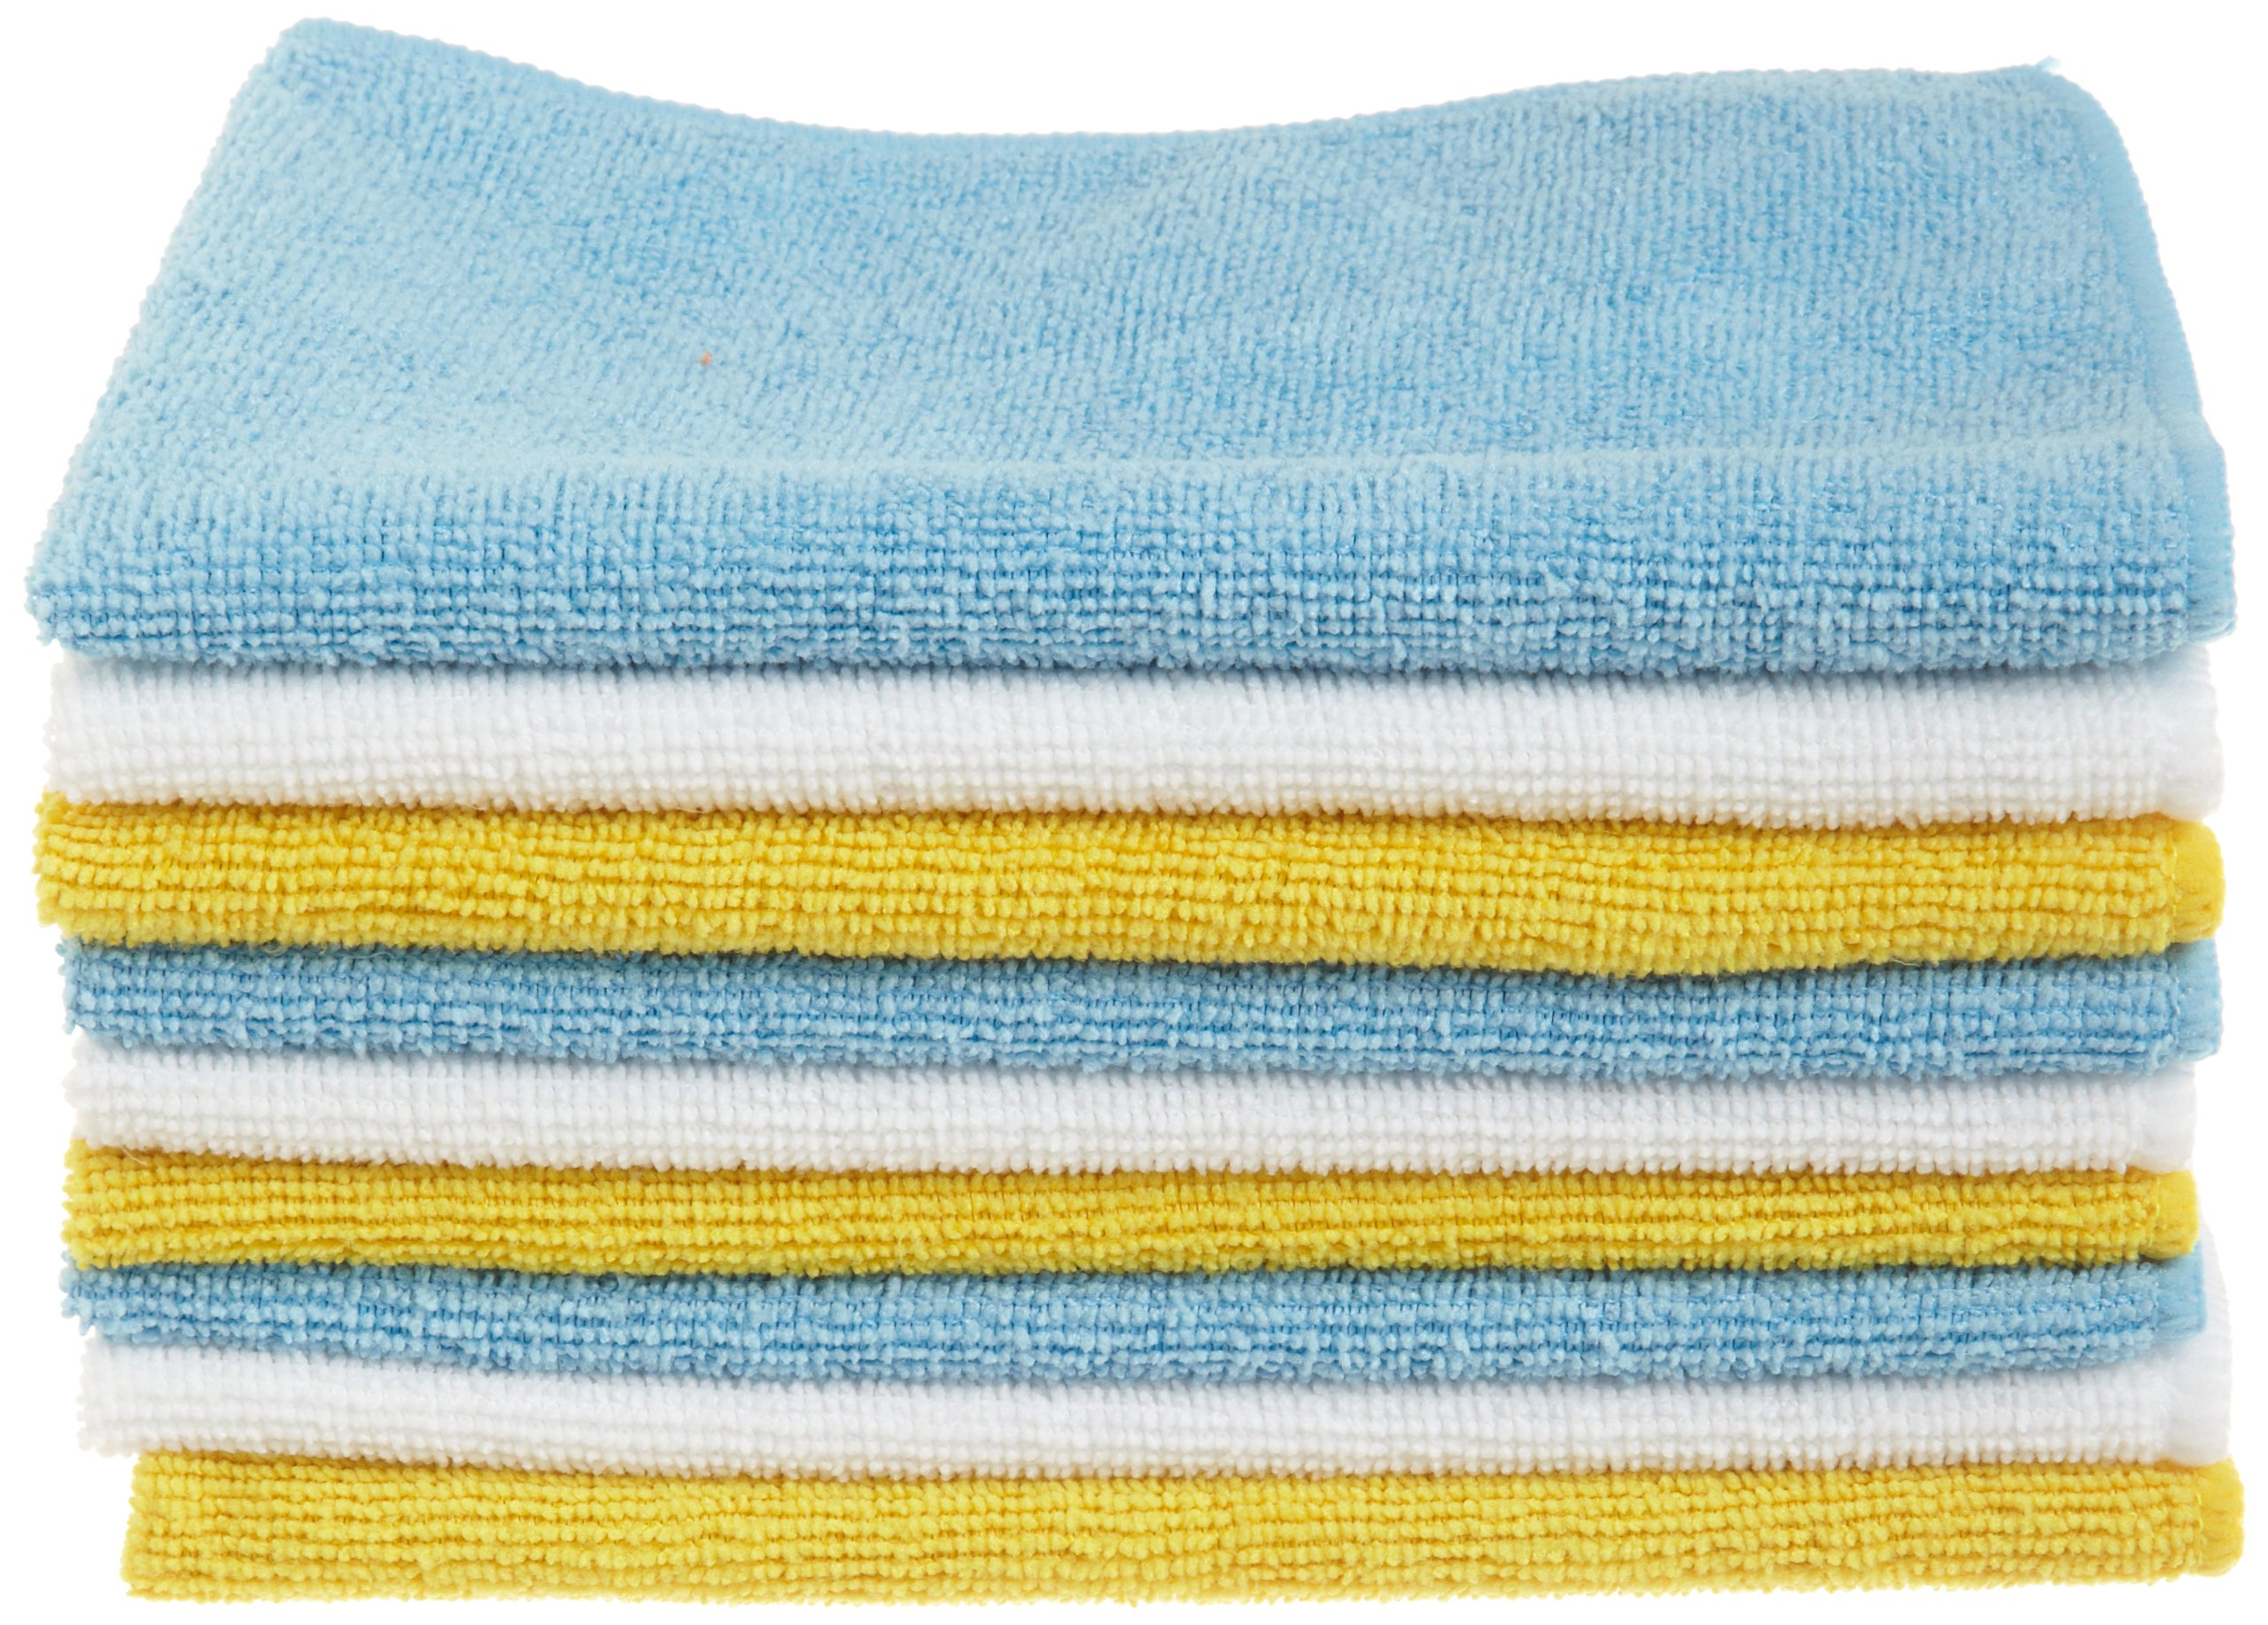 AmazonBasics Blue and Yellow Microfiber Cleaning Cloth, 144-Pack by AmazonBasics